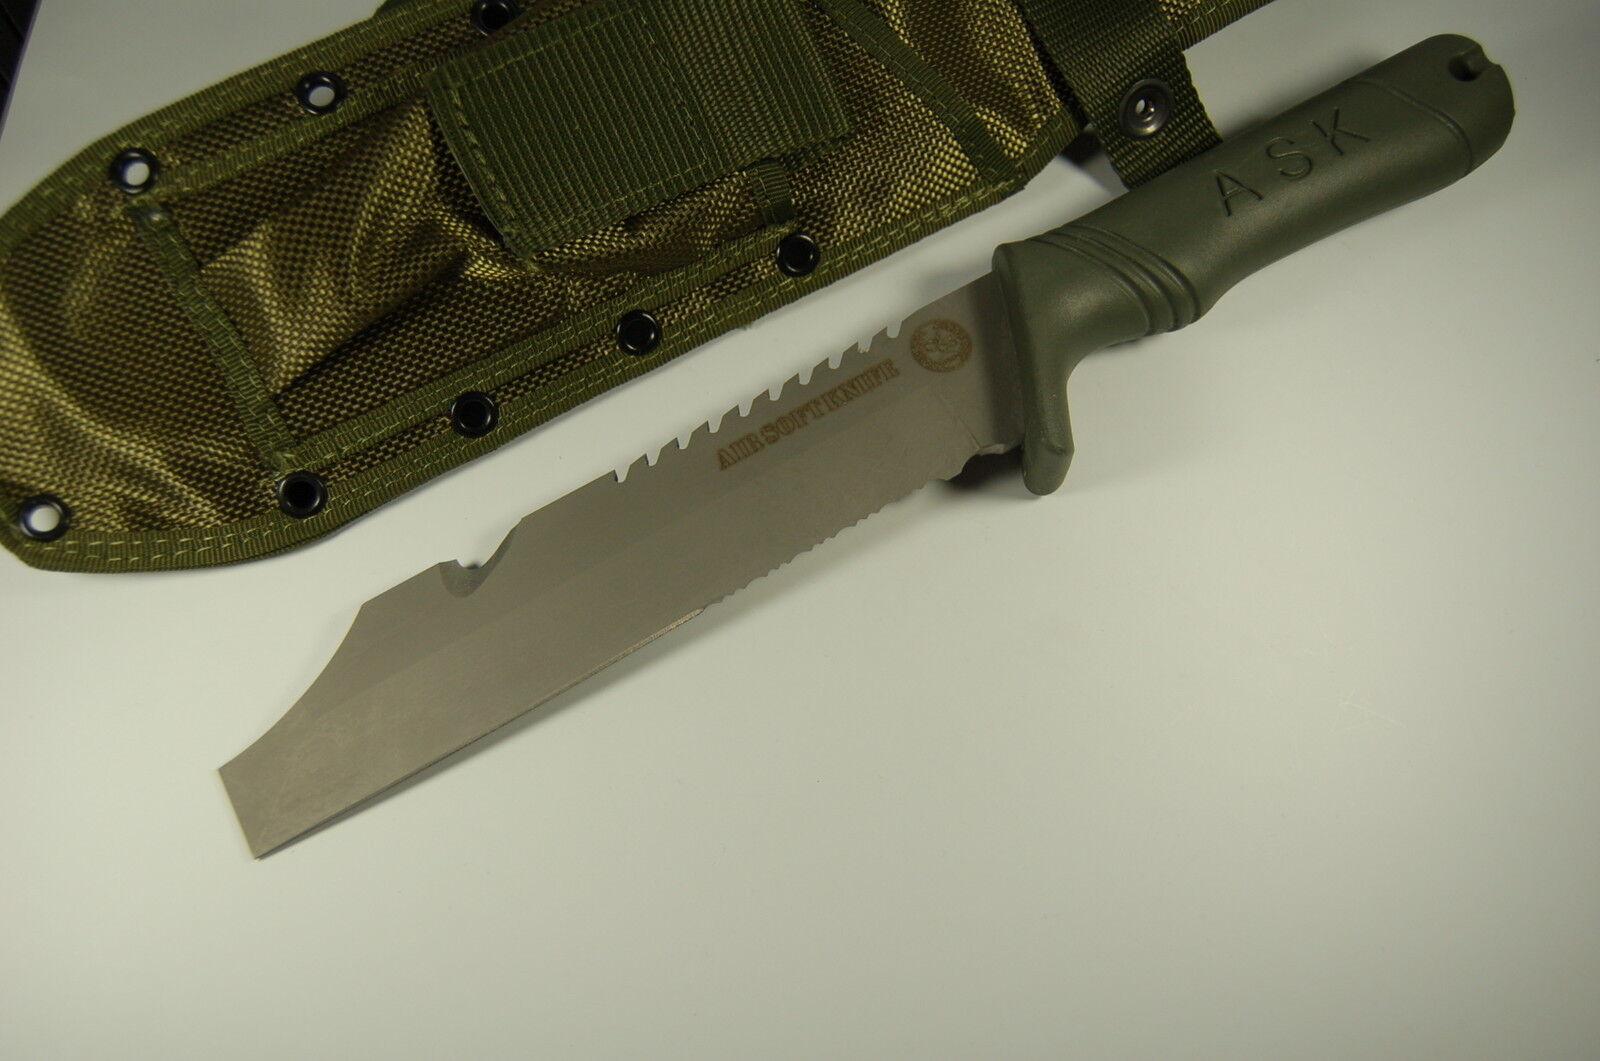 MAC Coltellerie ASK Outdoormesser Einsatzmesser Einsatzmesser Einsatzmesser Maniago Italien  | Gemäßigten Kosten  181c4e